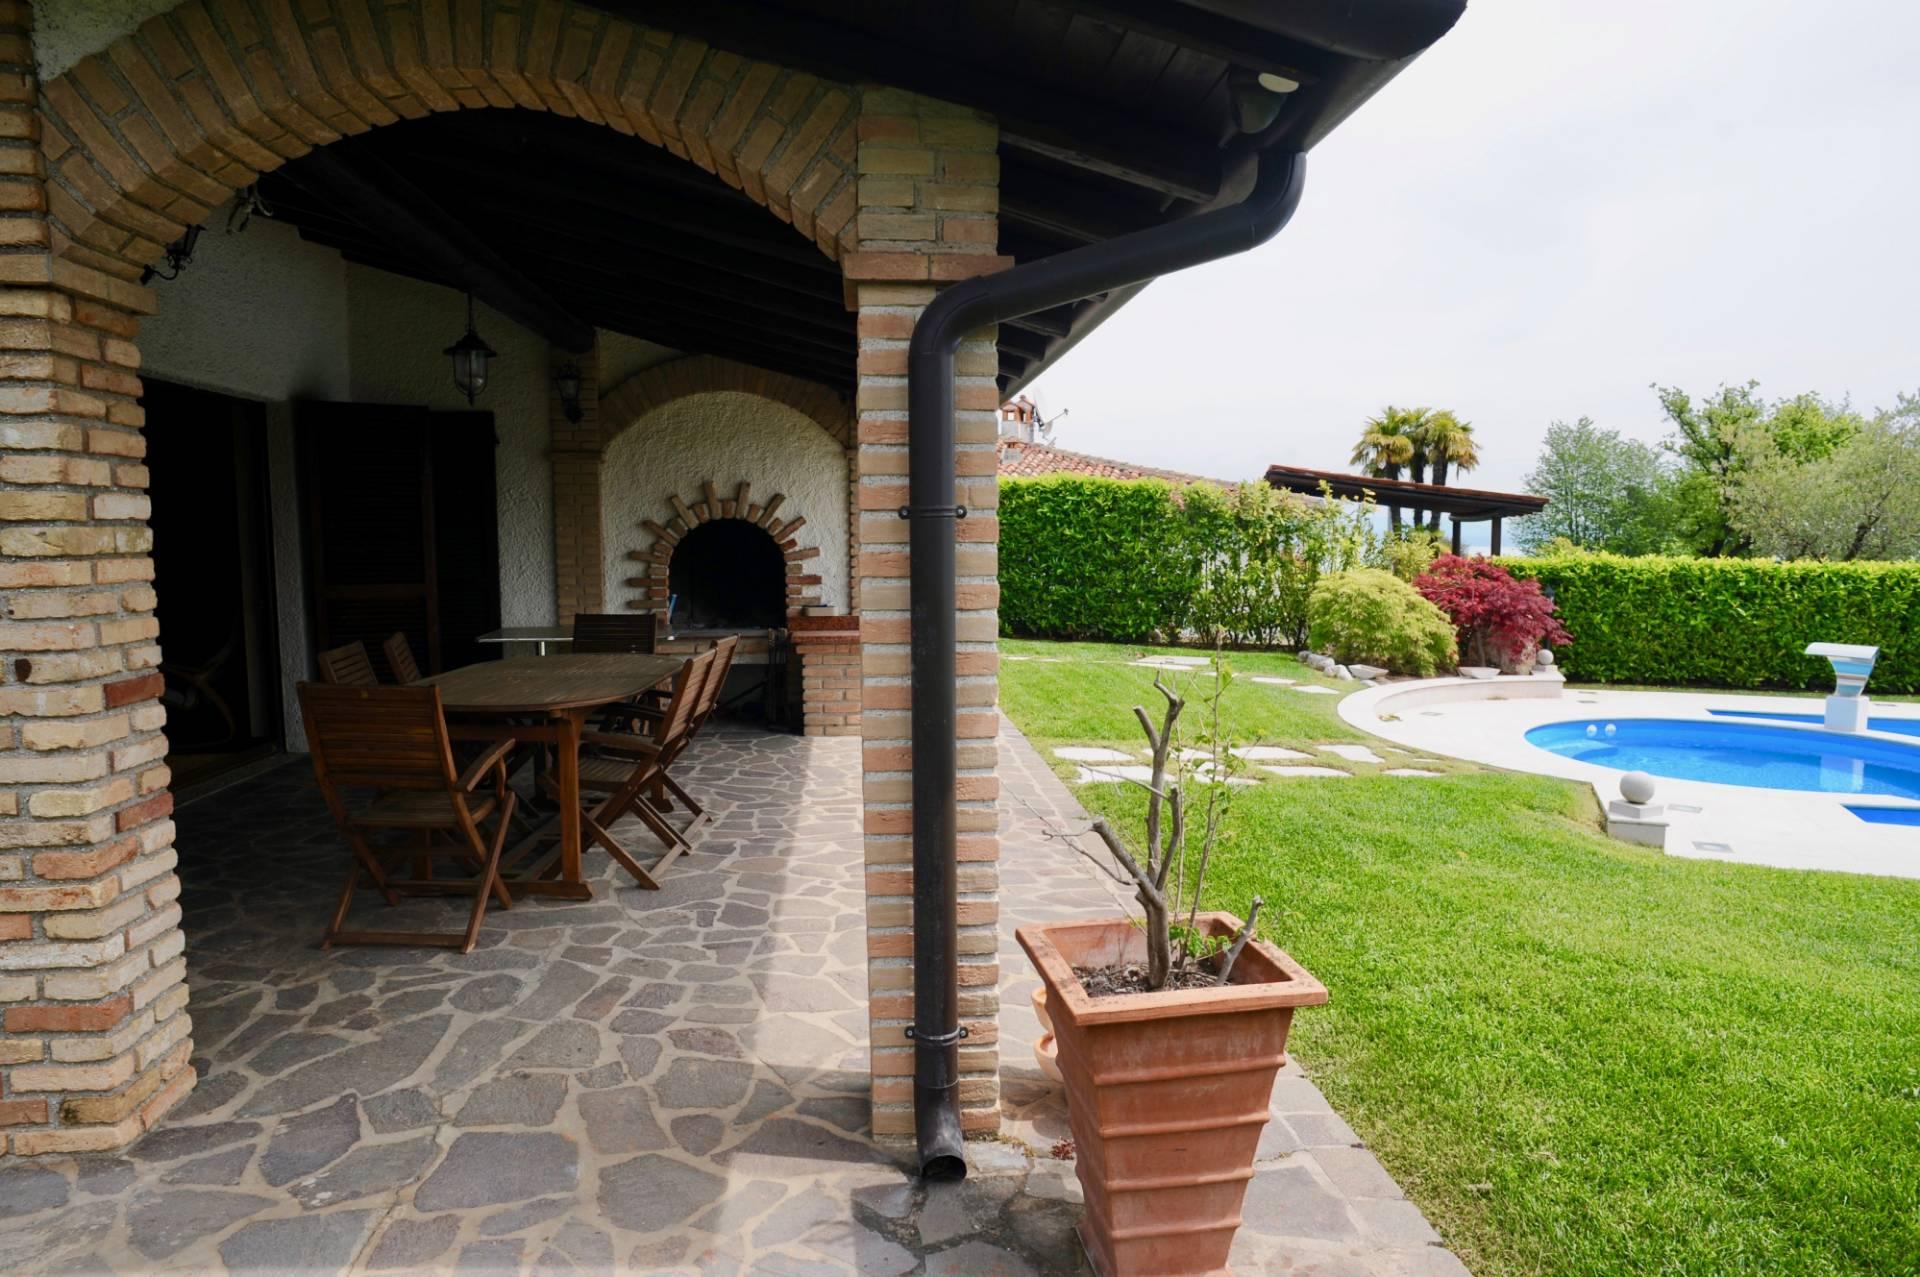 Villa in Vendita a Padenghe Sul Garda: 3 locali, 100 mq - Foto 22